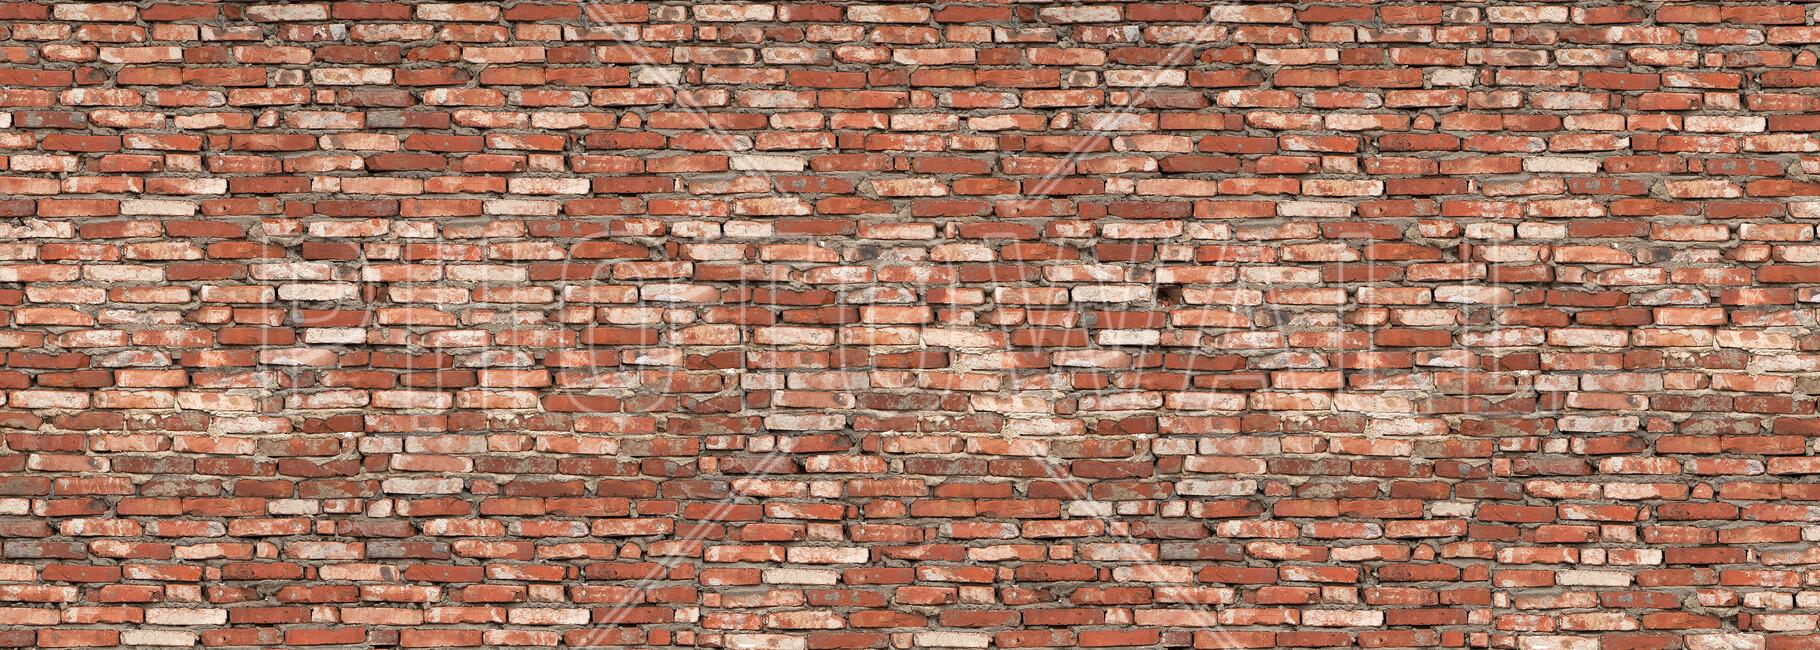 Old Brick Wall Decor : Old brick wall red canvas print art photowall